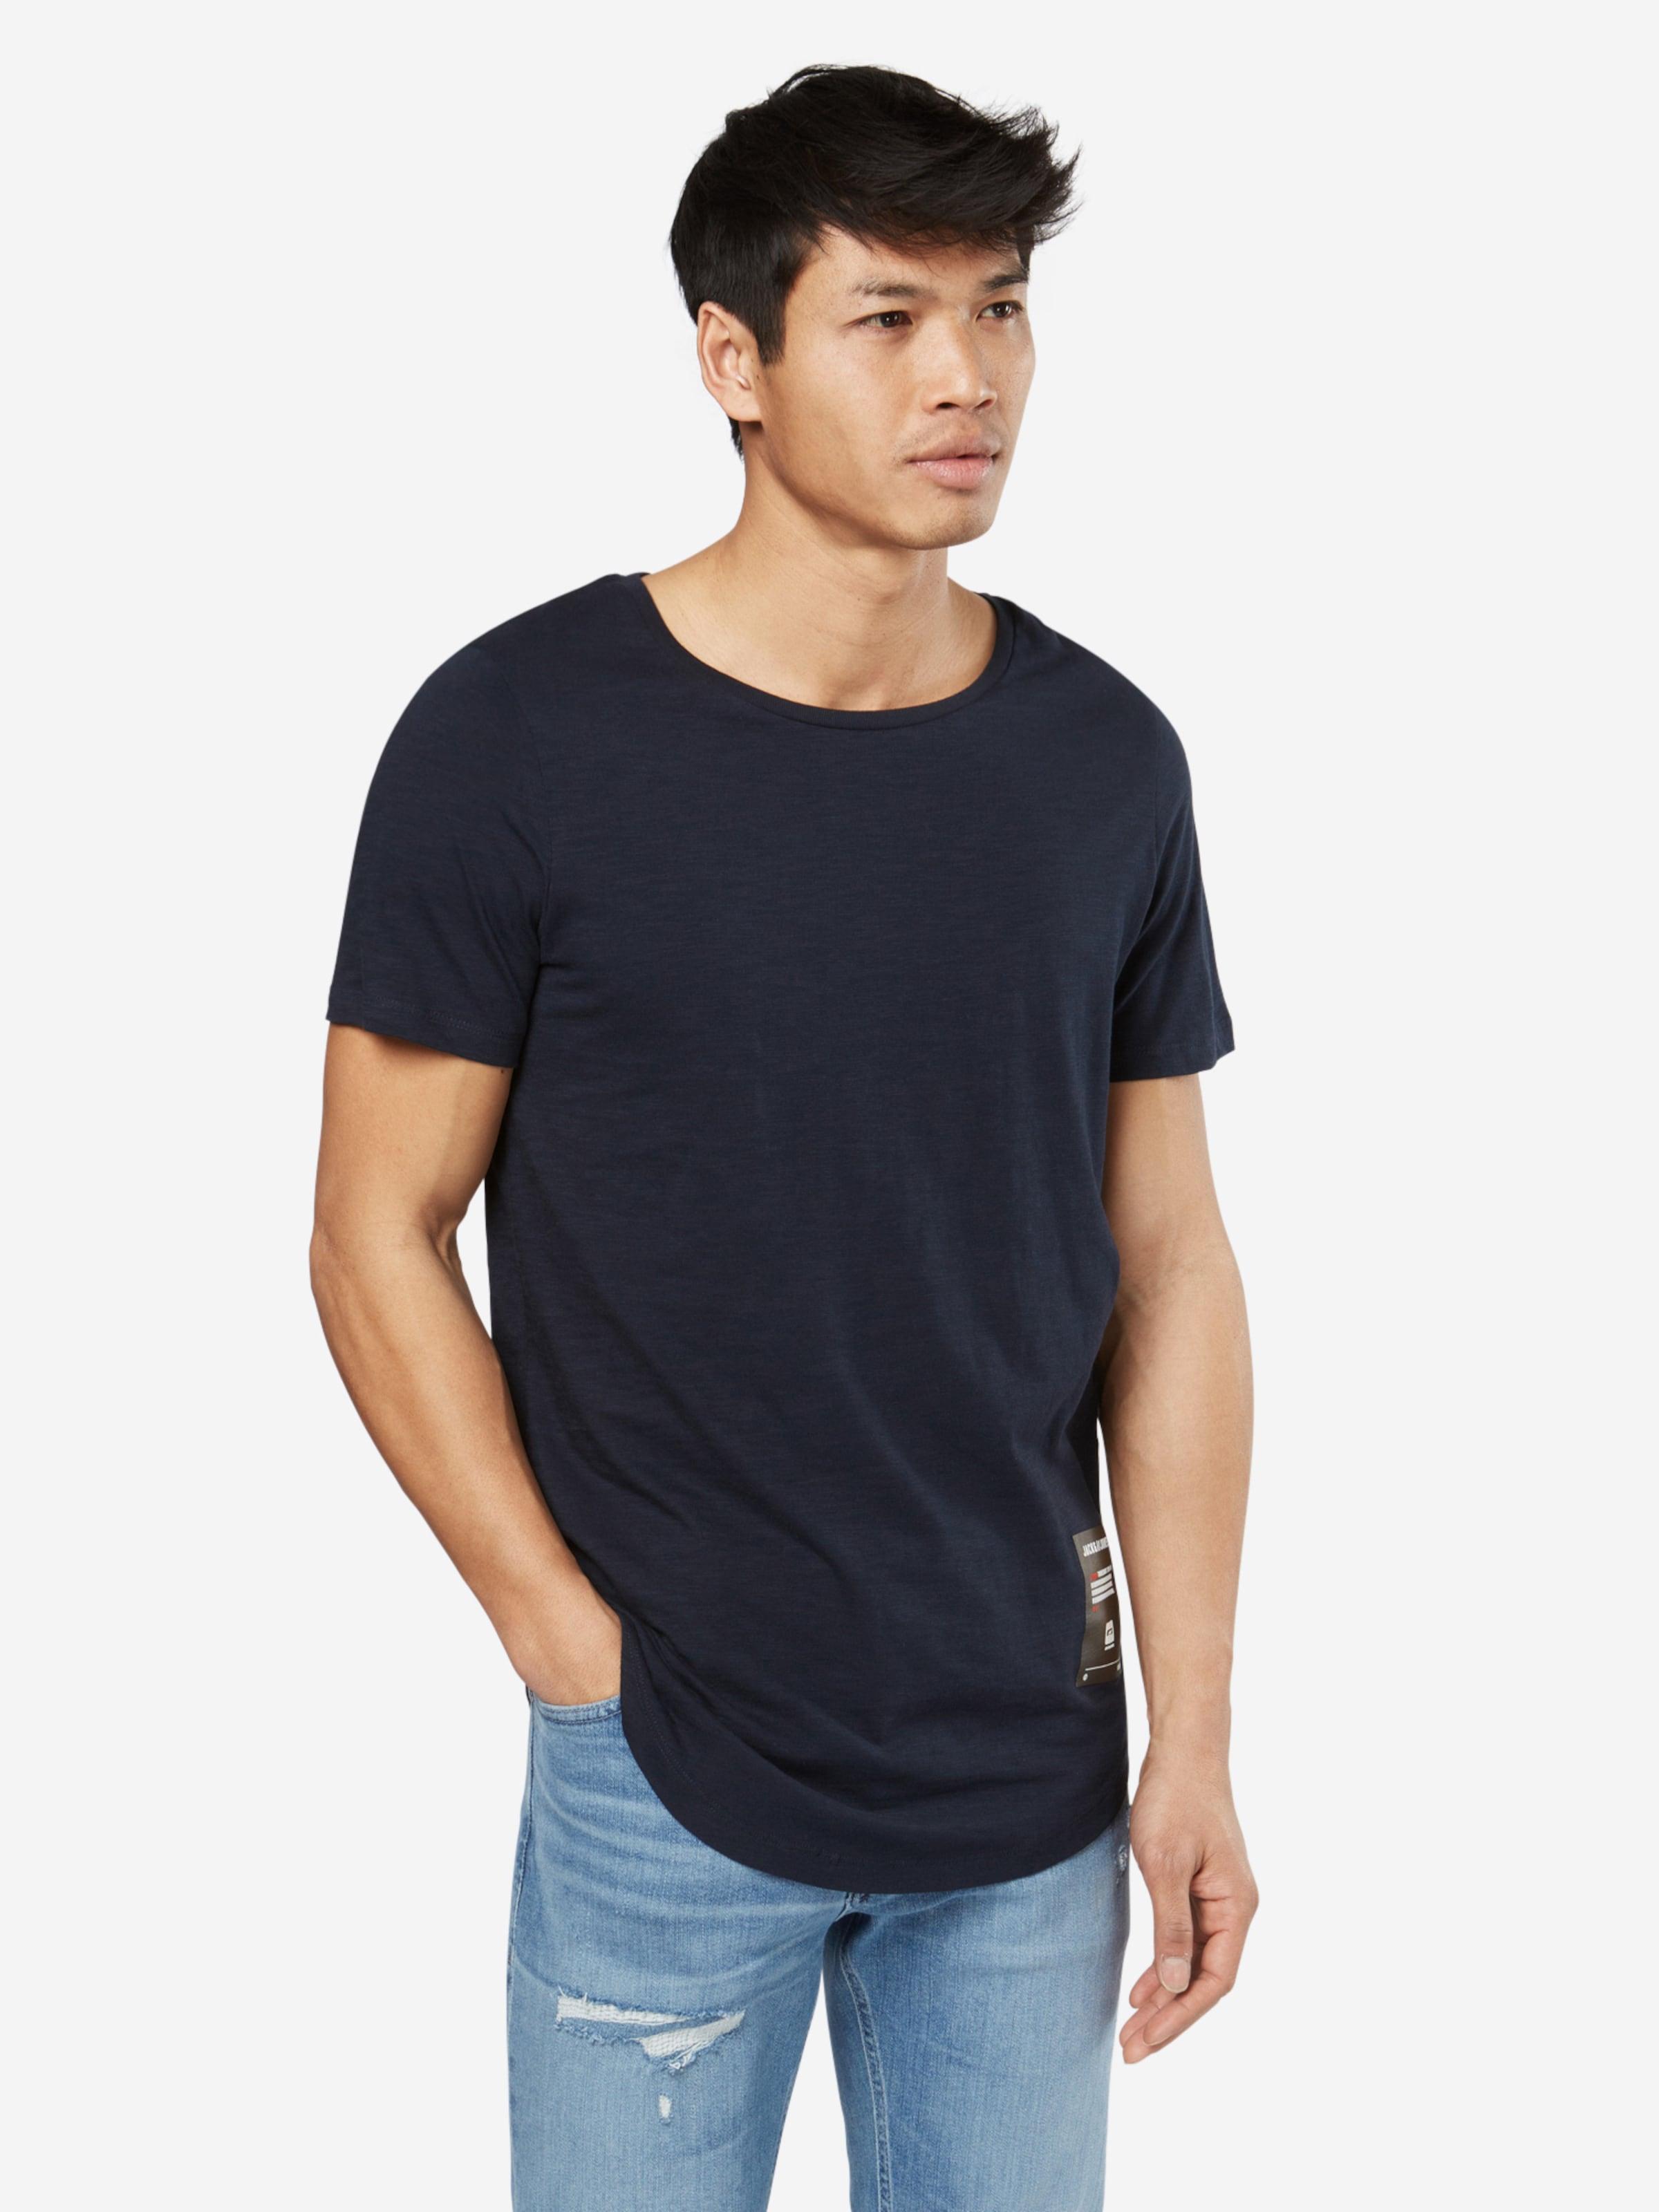 NECK' JONES SS amp; TEE CREW 'JCOVAND T JACK Shirt H8xaq1